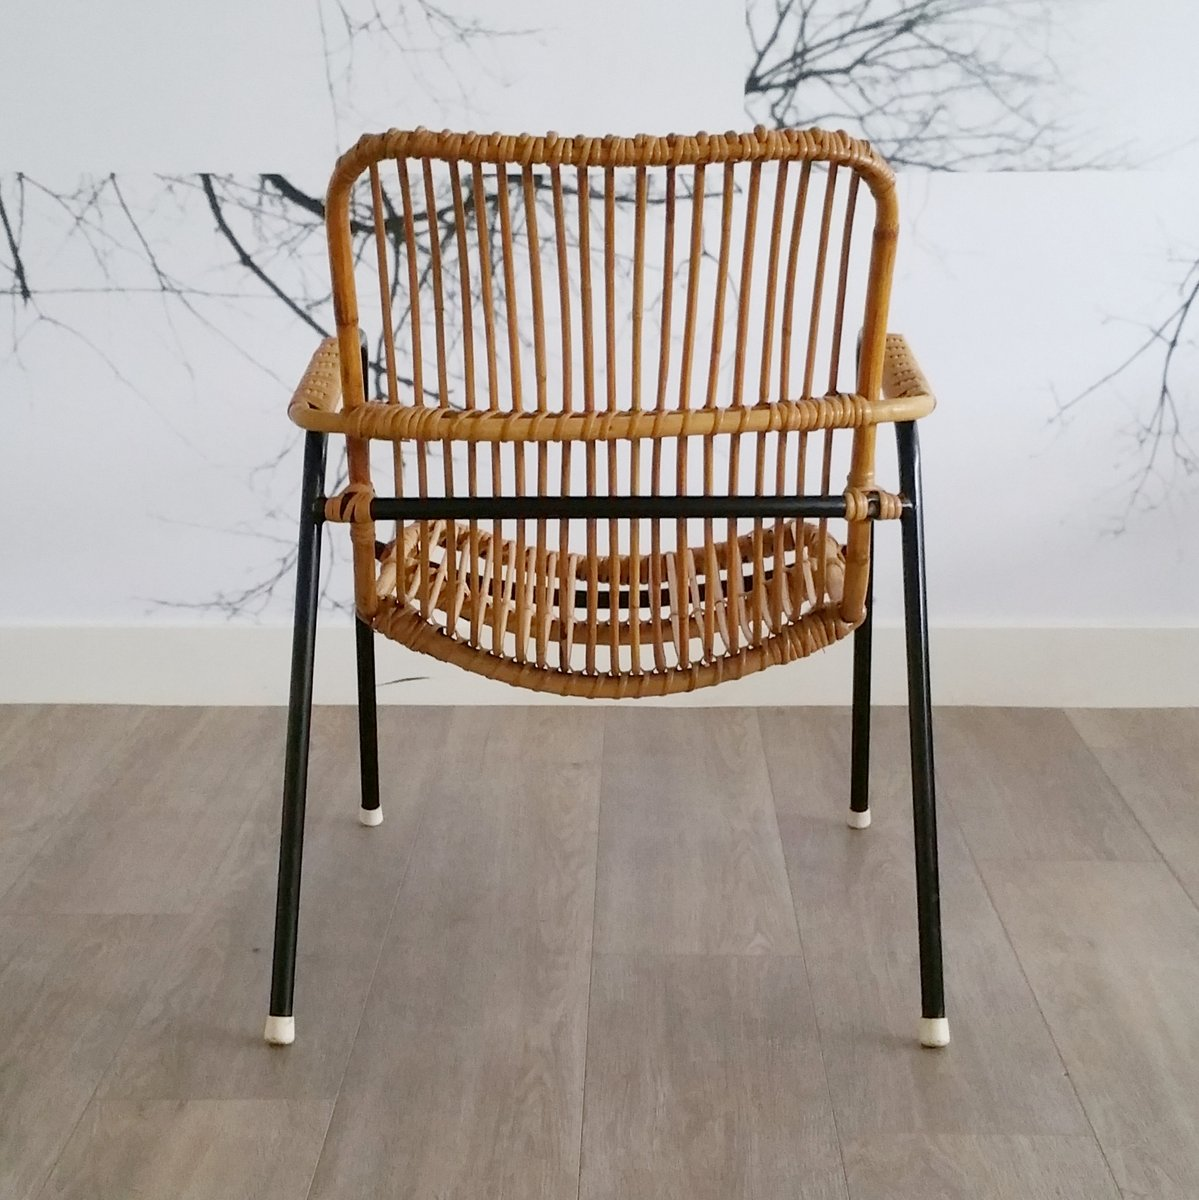 Vintage Stuhl Aus Rattan & Metall 1950er Bei Pamono Kaufen